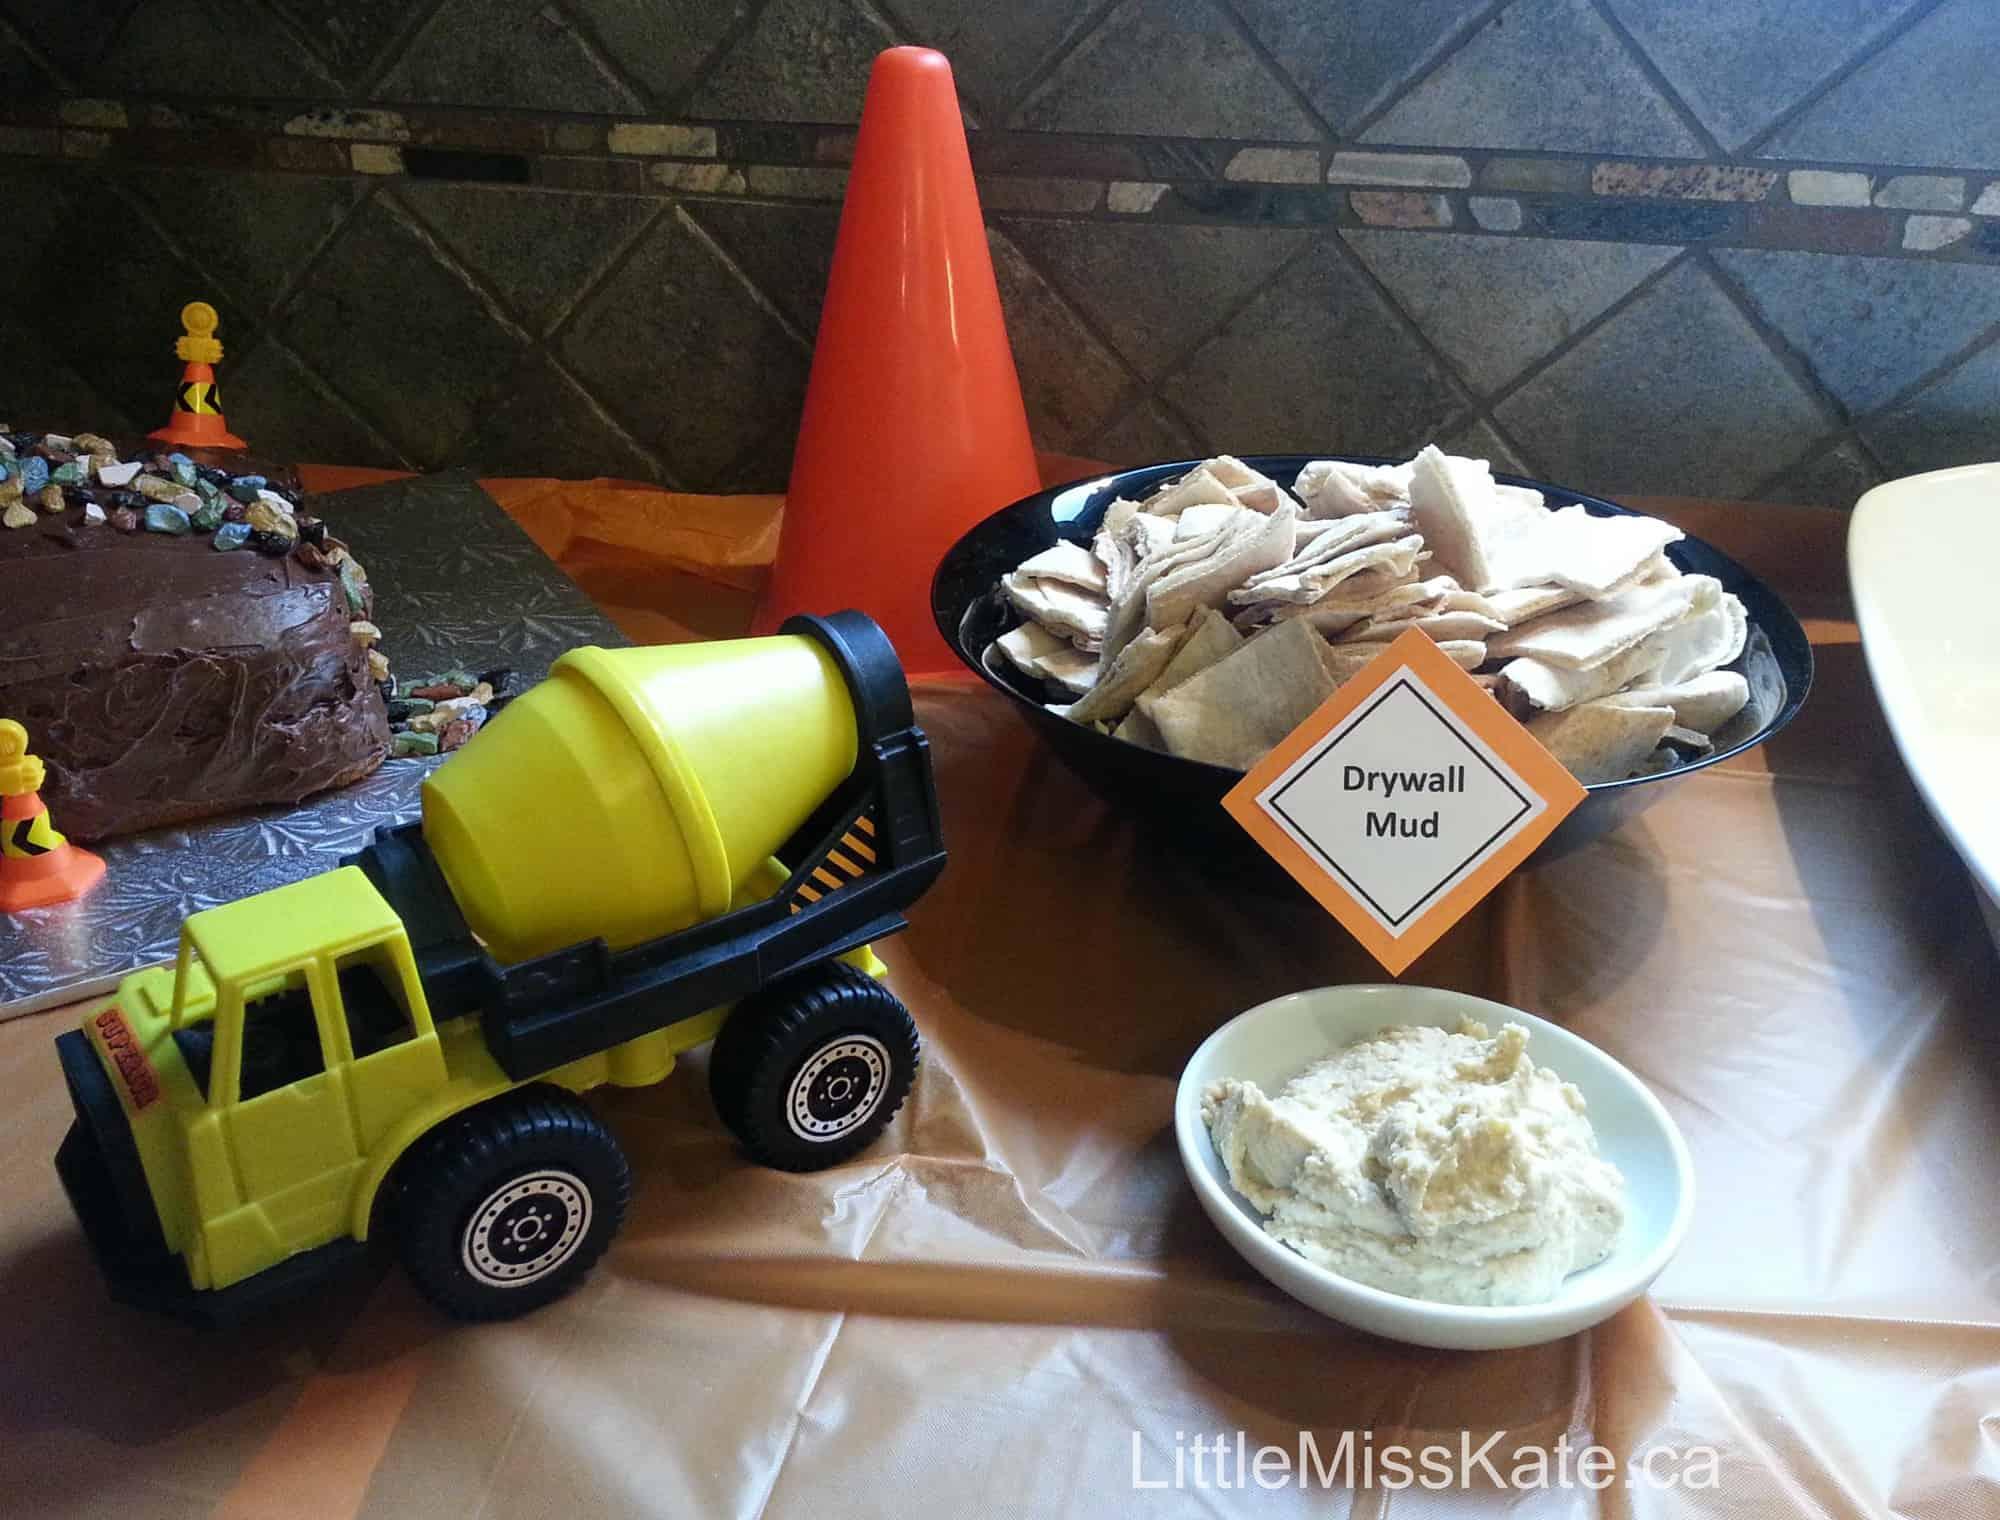 construction birthday party food ideas 6